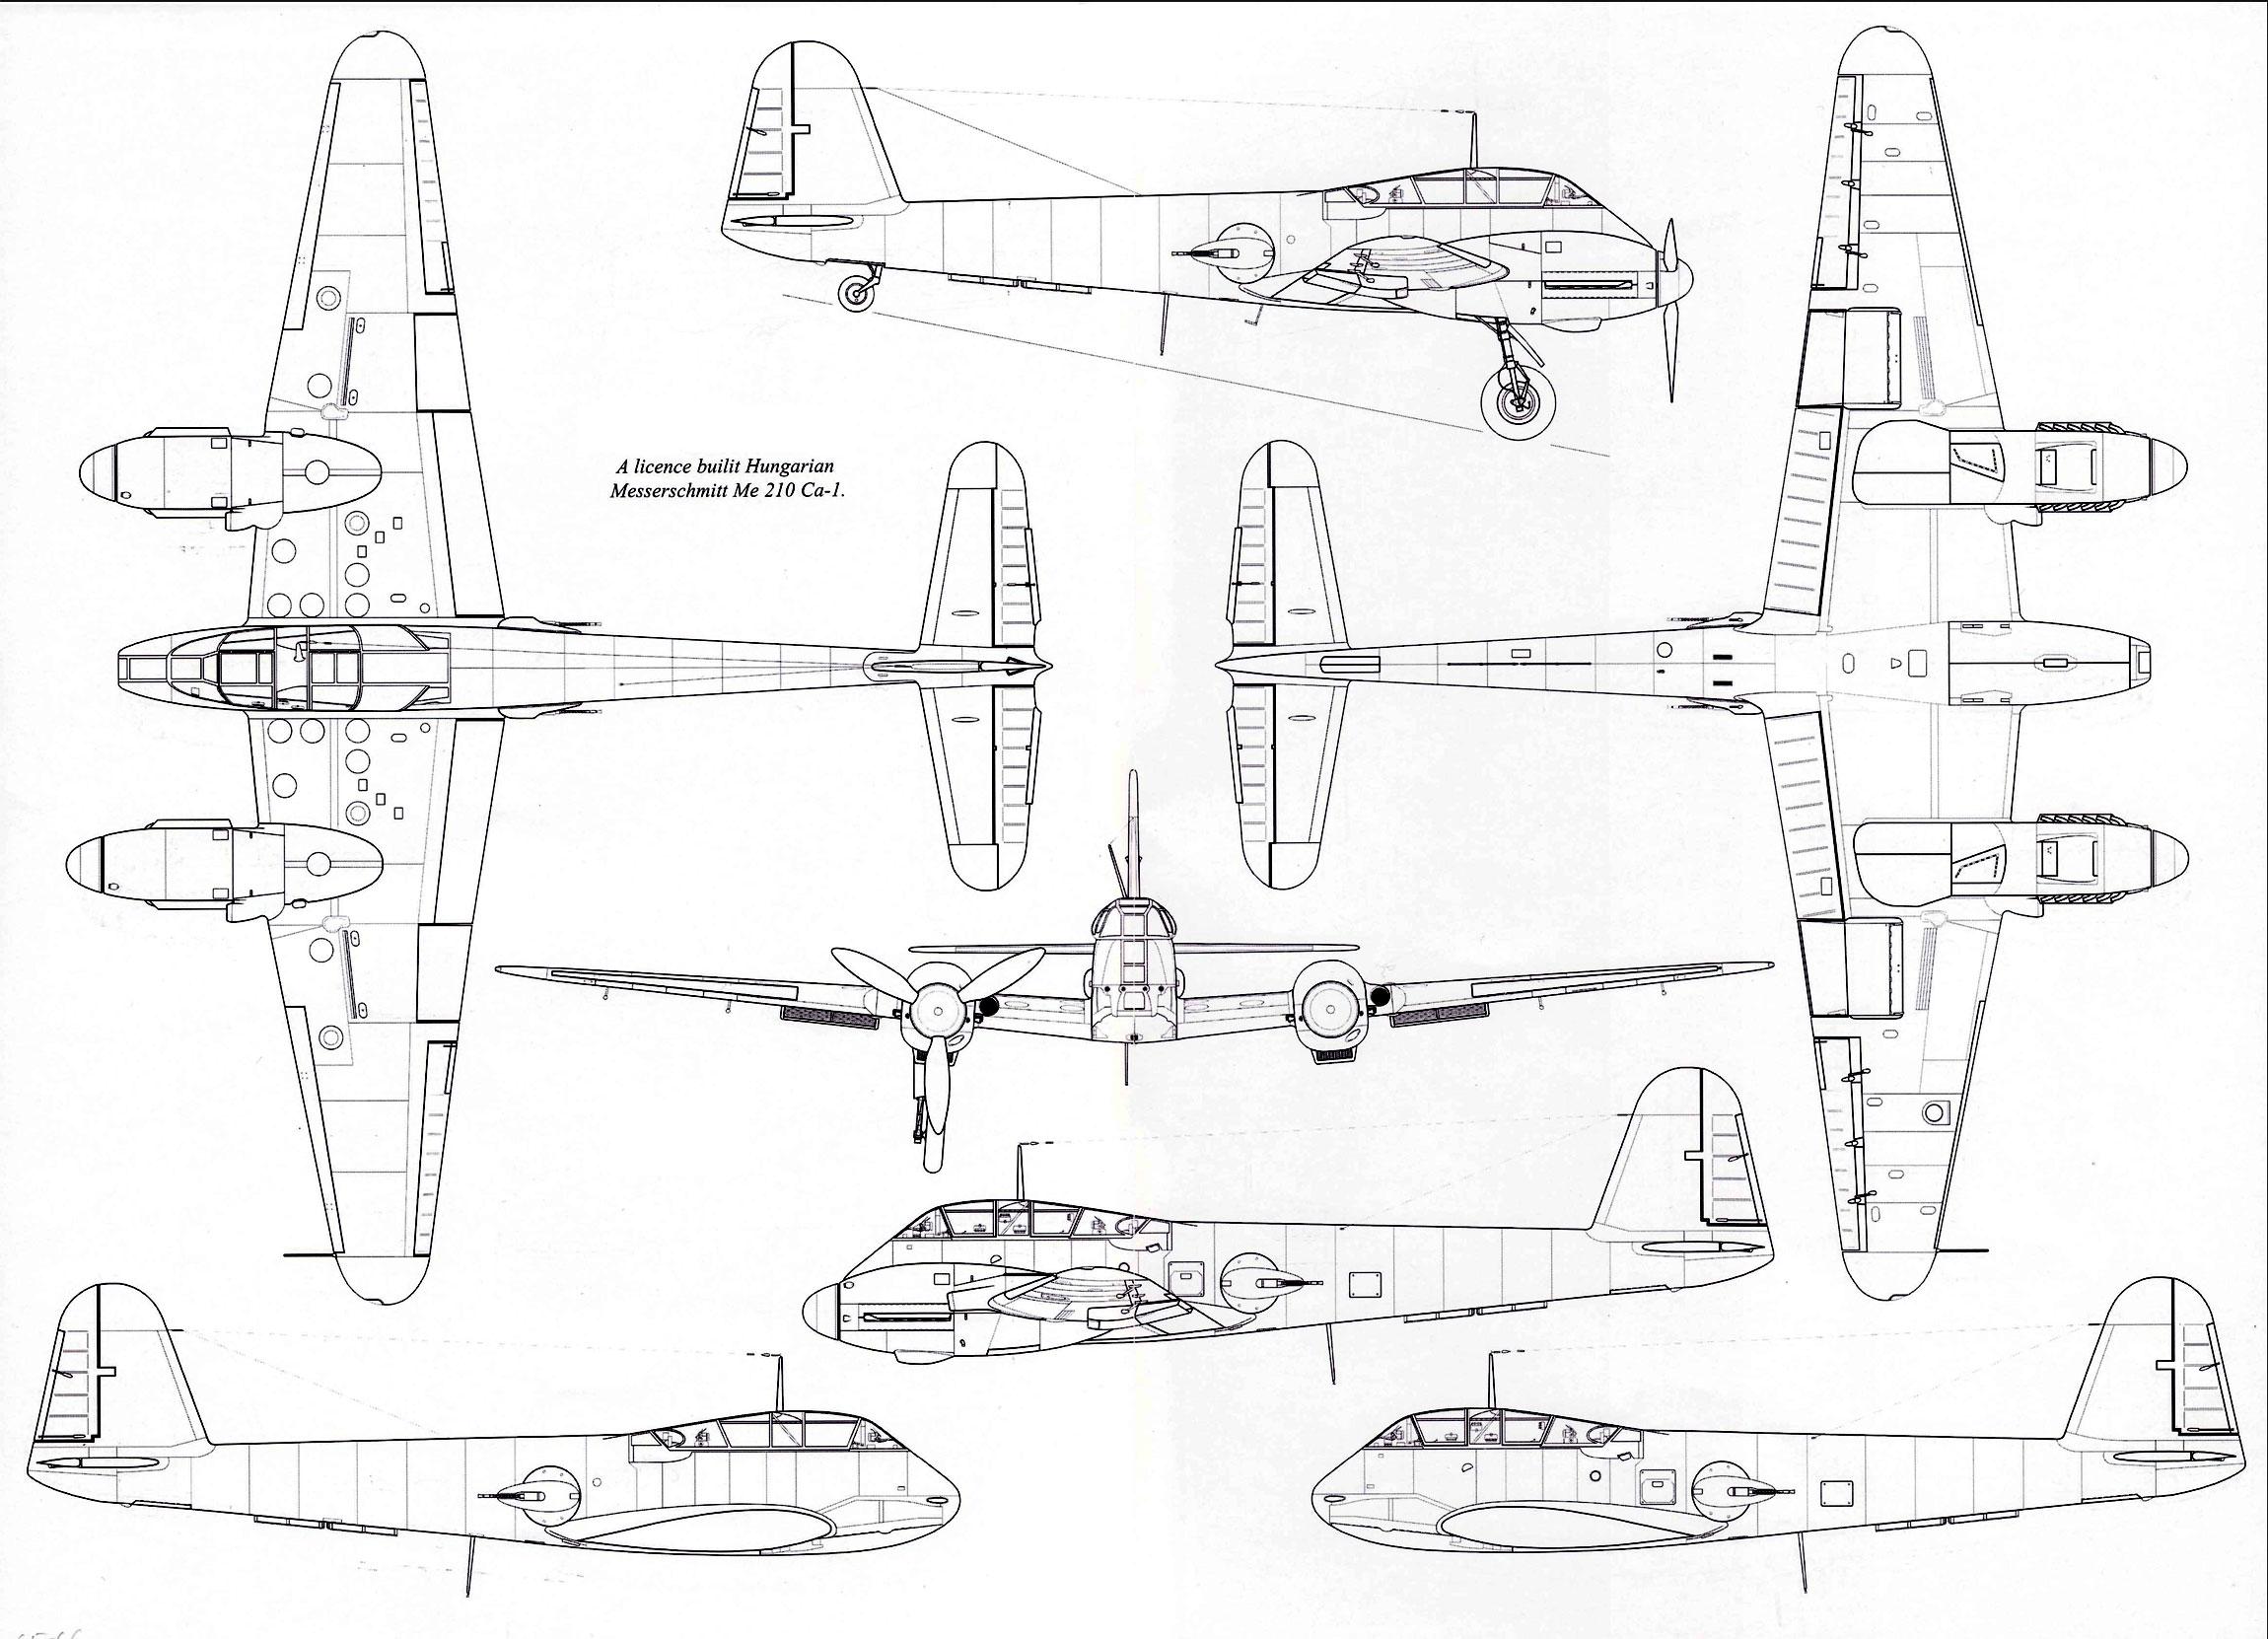 Messerschmitt Me 410C1 Hornisse 1 72 scale Line drawing 01